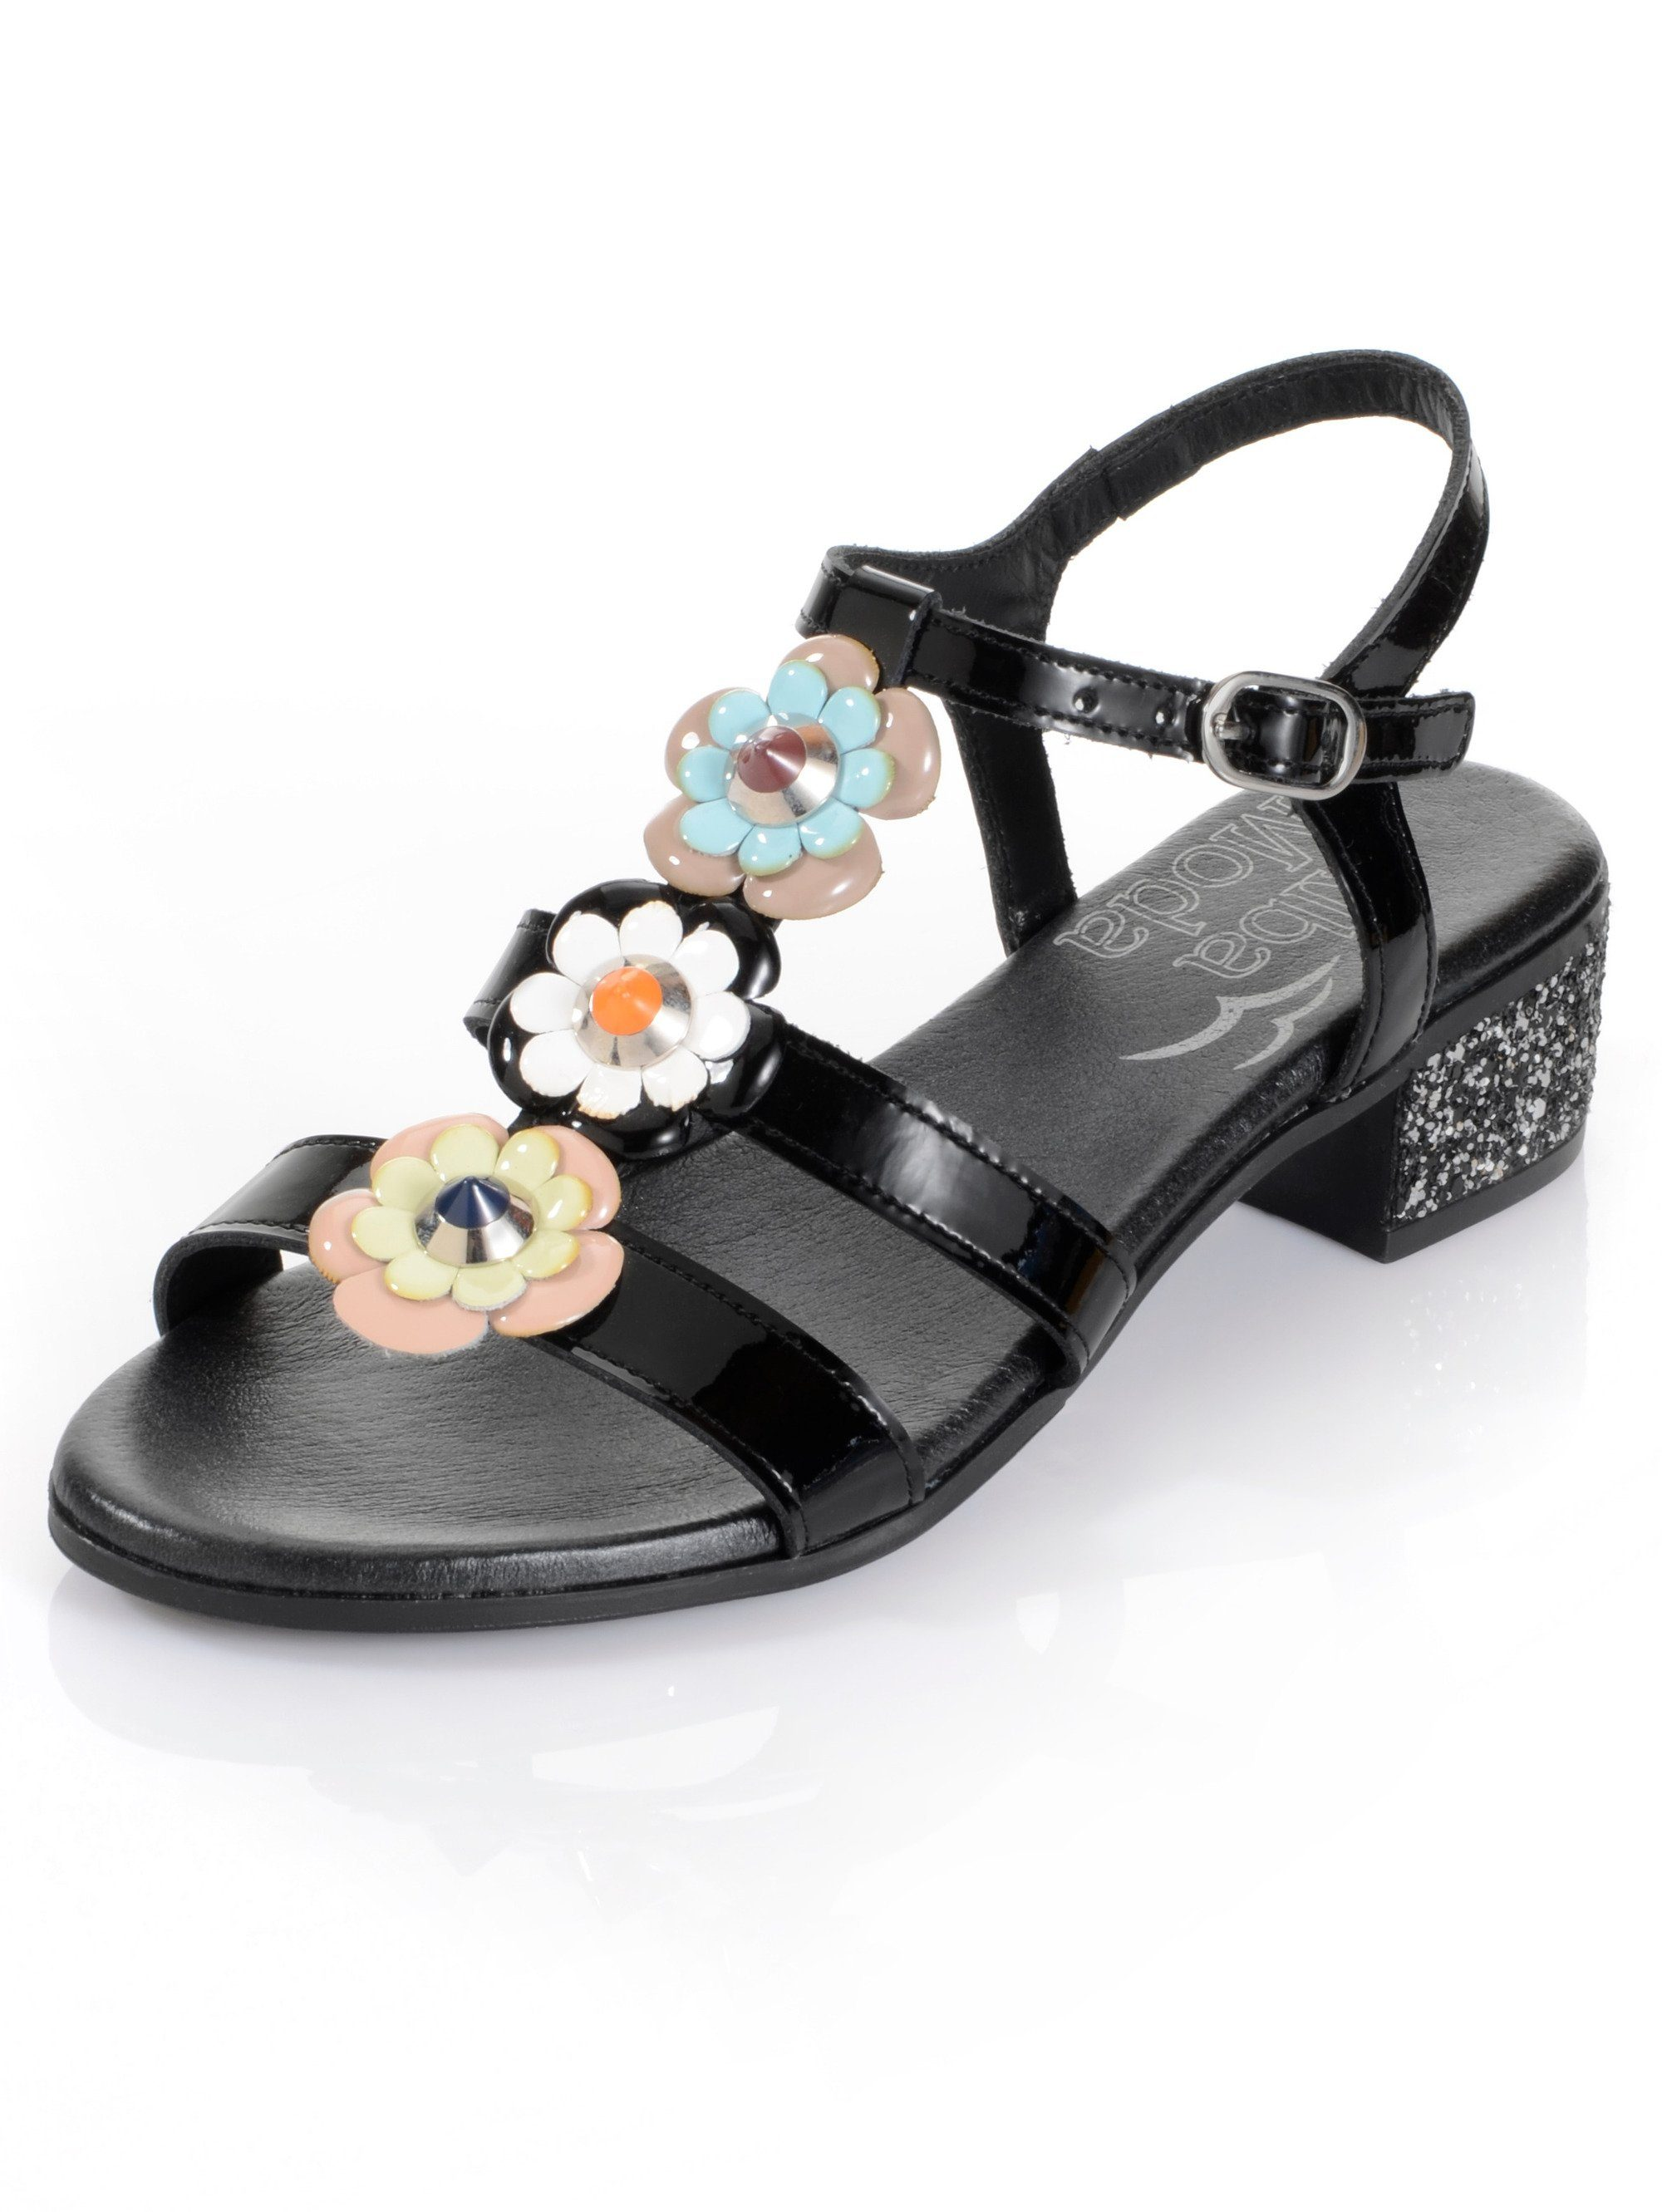 Alba Moda Sandalette aus Lackleder online kaufen  schwarz#ft5_slash#multi